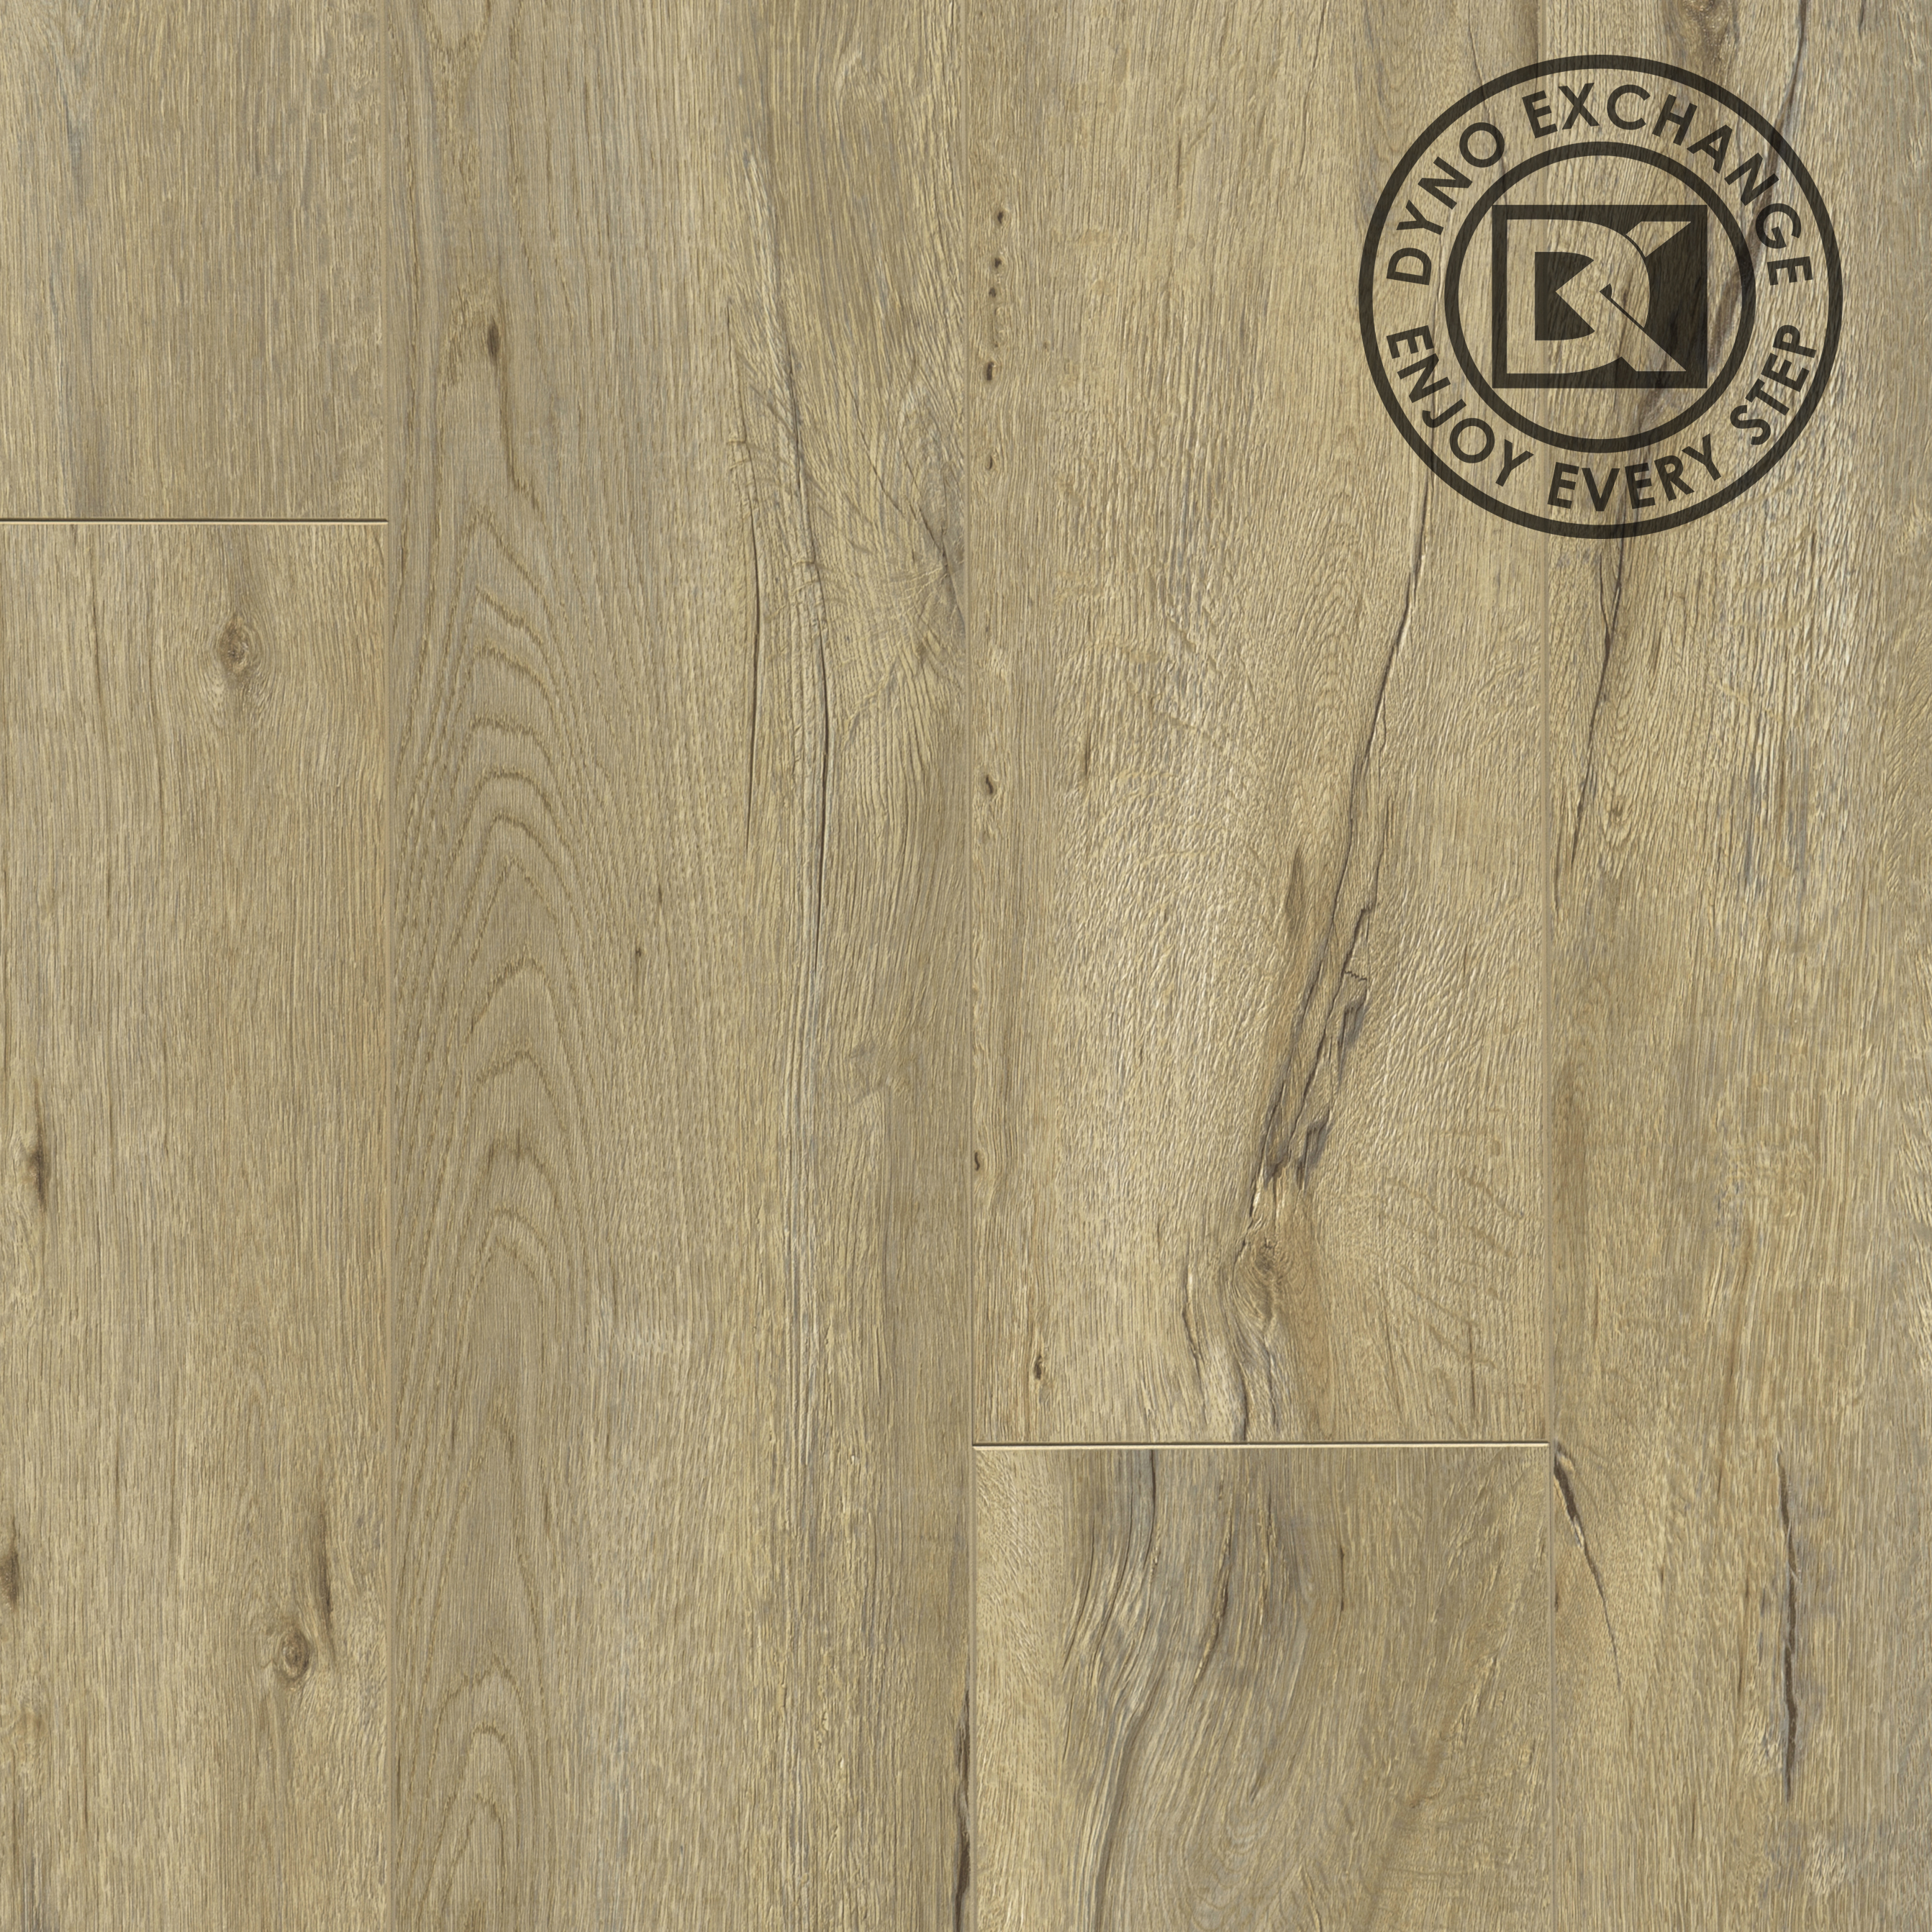 Dyno Exchange, Essence Collection Laminate Flooring, Newport Sand (20.15 sqft/box)